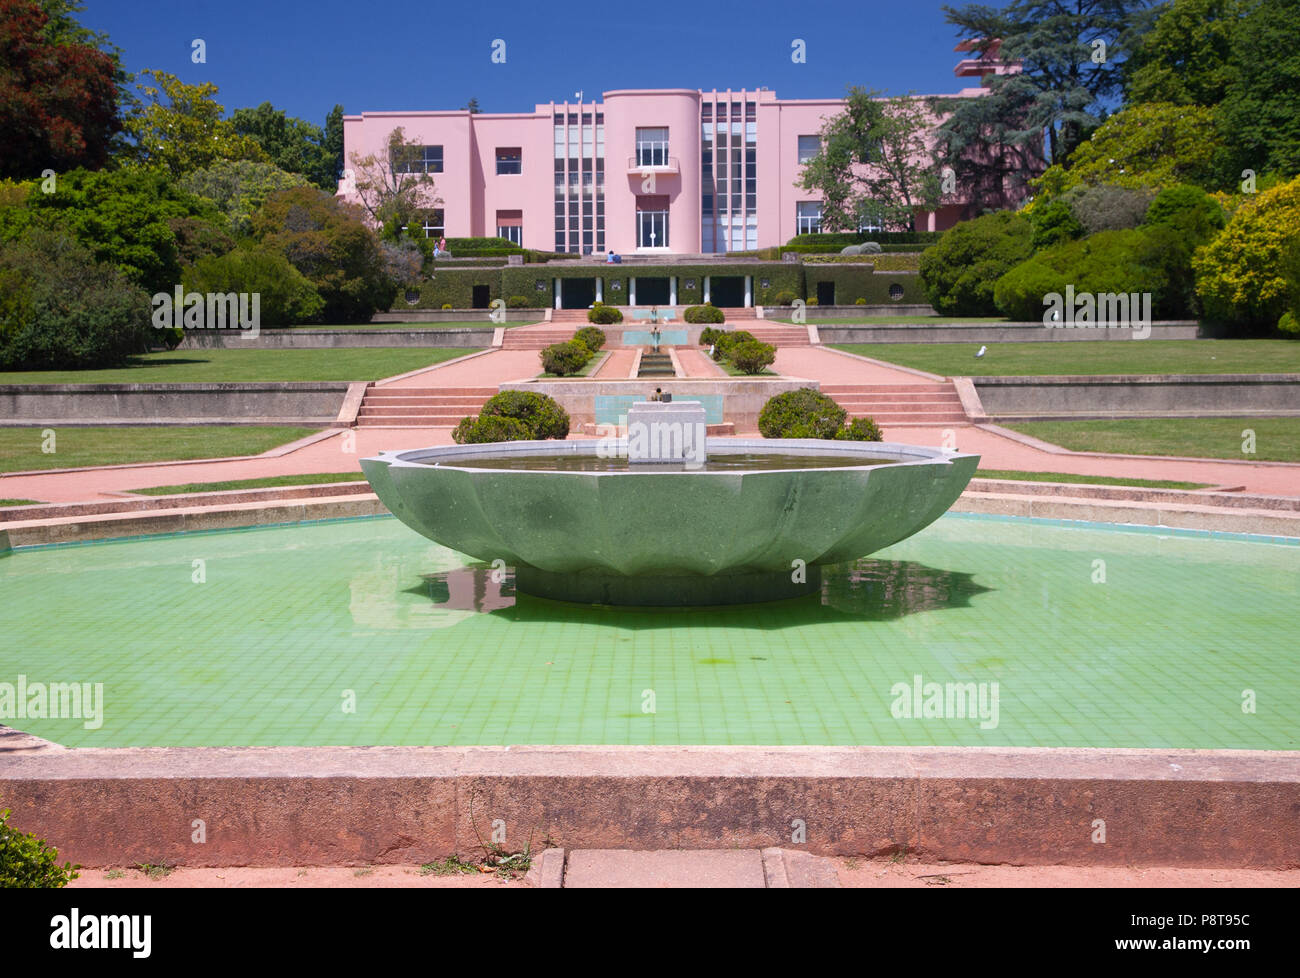 Serralves Gardens, next to the Serralves Foundation Museum of  Contemporary Art, in Oporto, Portugal - Stock Image